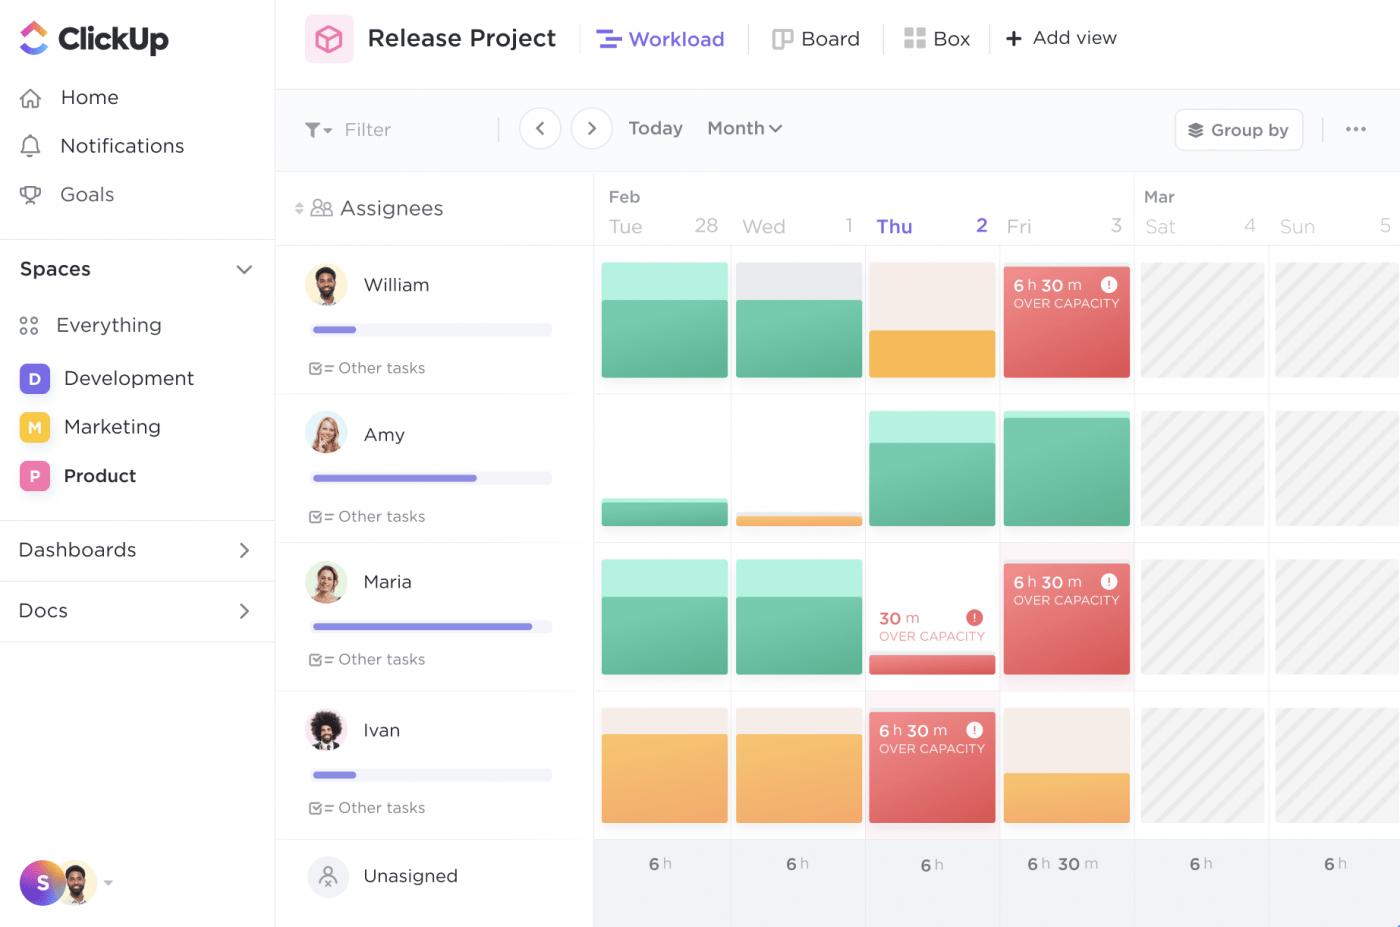 workloadview 3.0